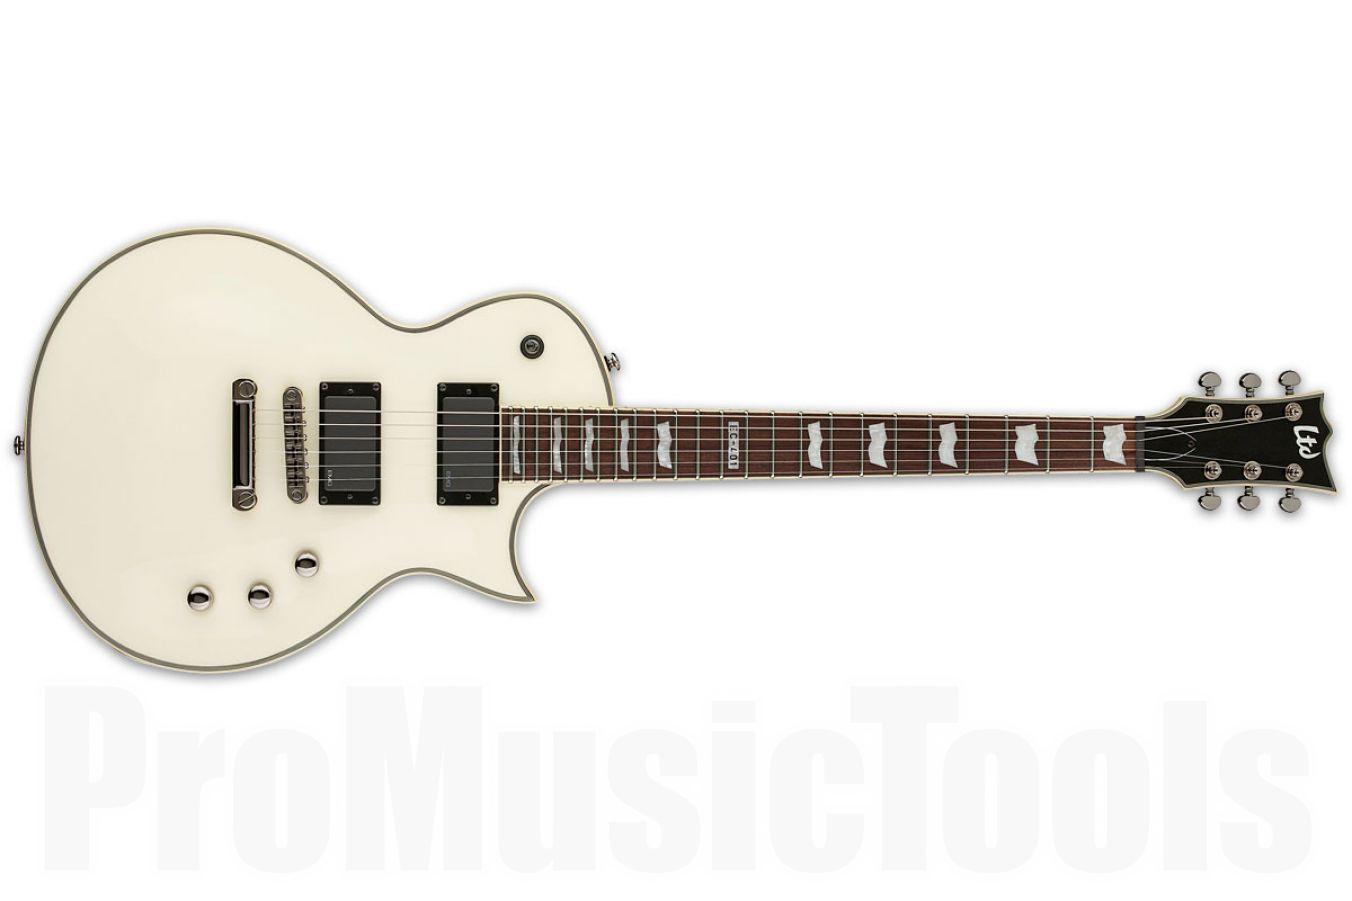 ESP Ltd Eclipse EC-401 OW - Olympic White - b-stock